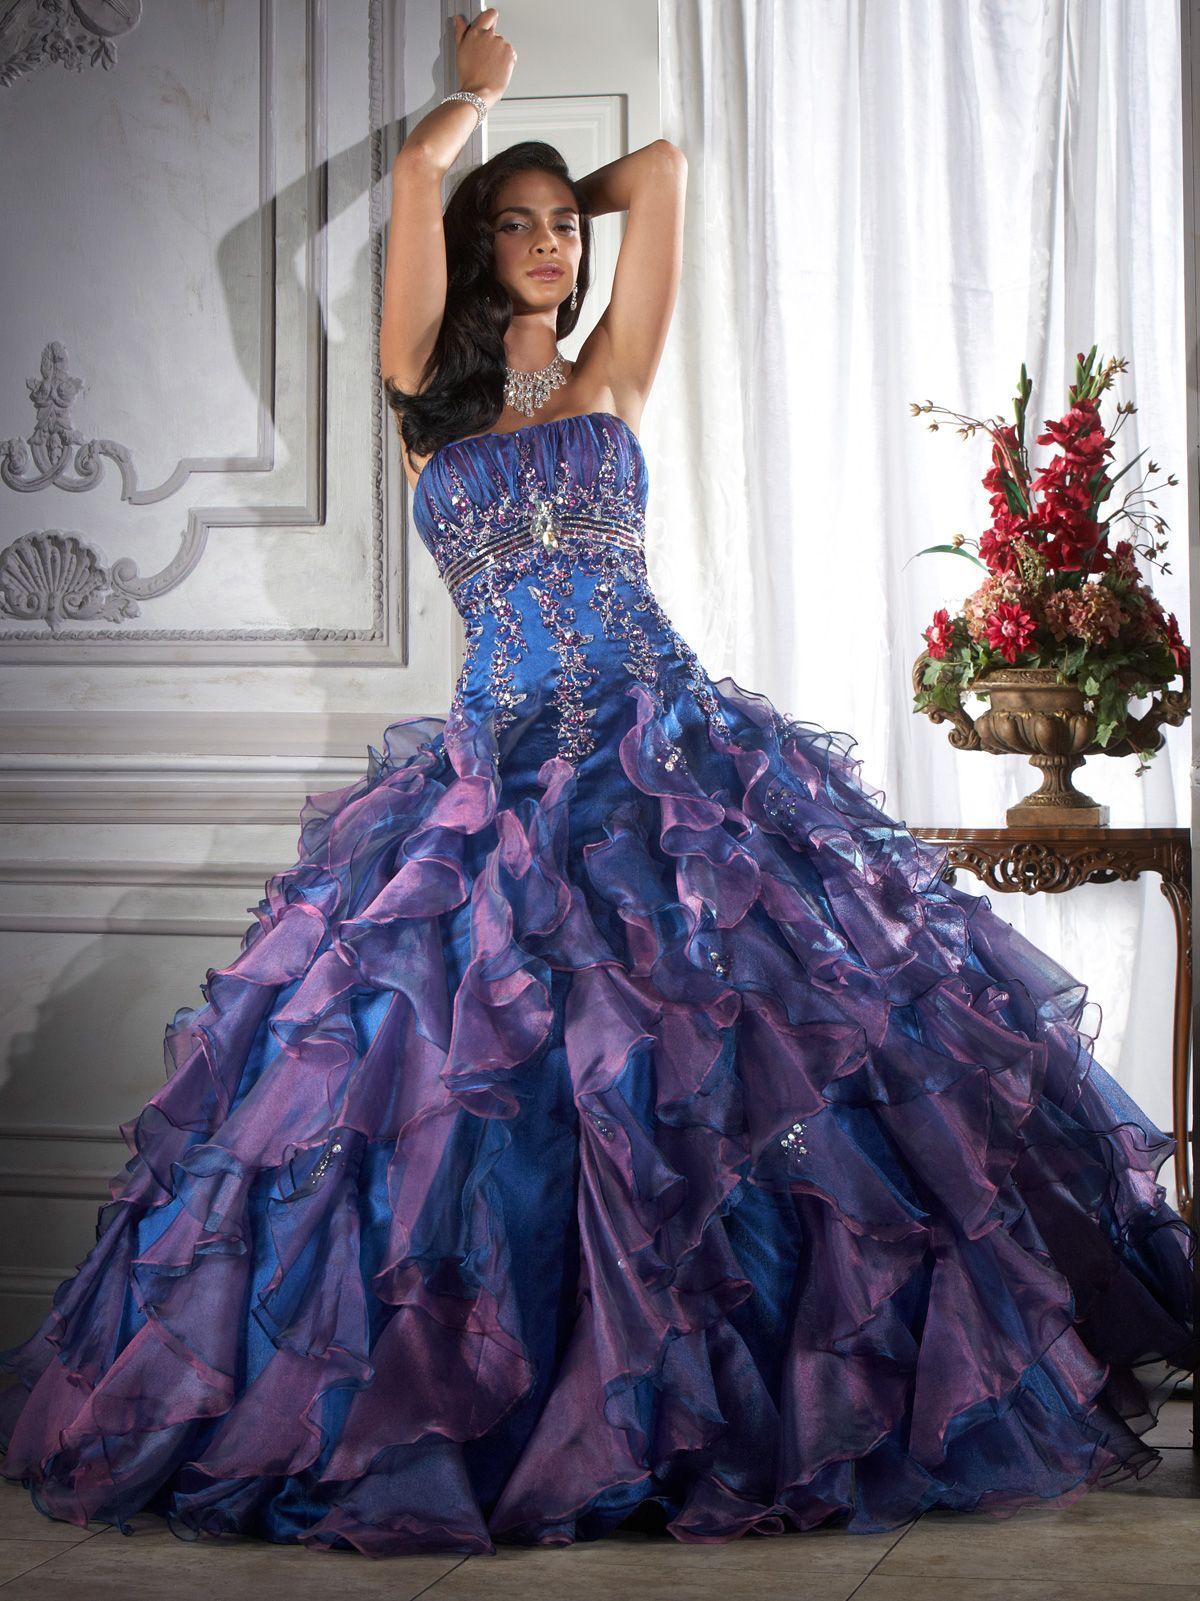 Small Of Purple Wedding Dress